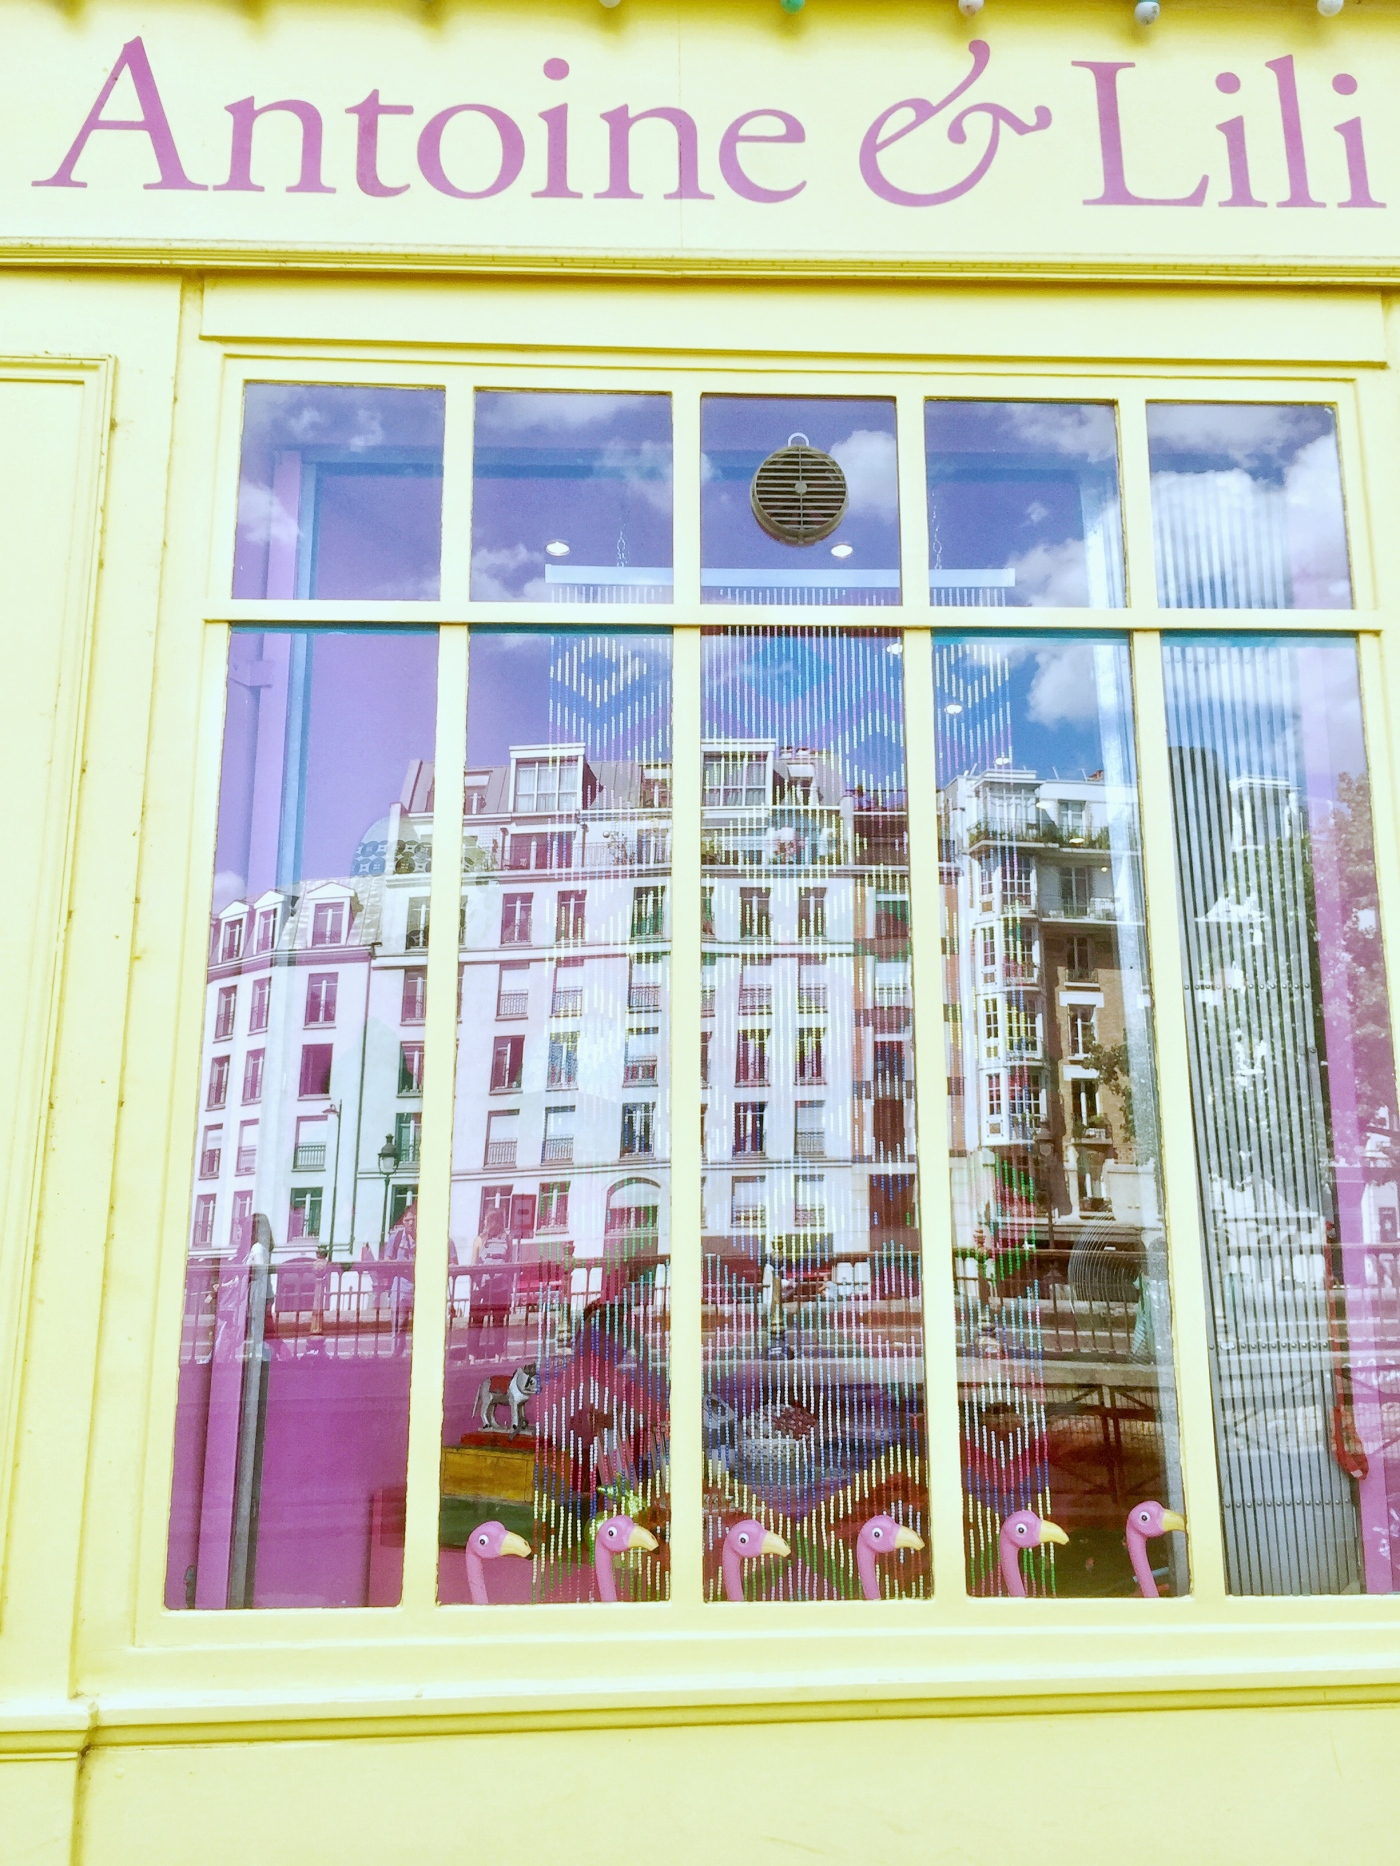 11 Paris visit Canal Saint Martin